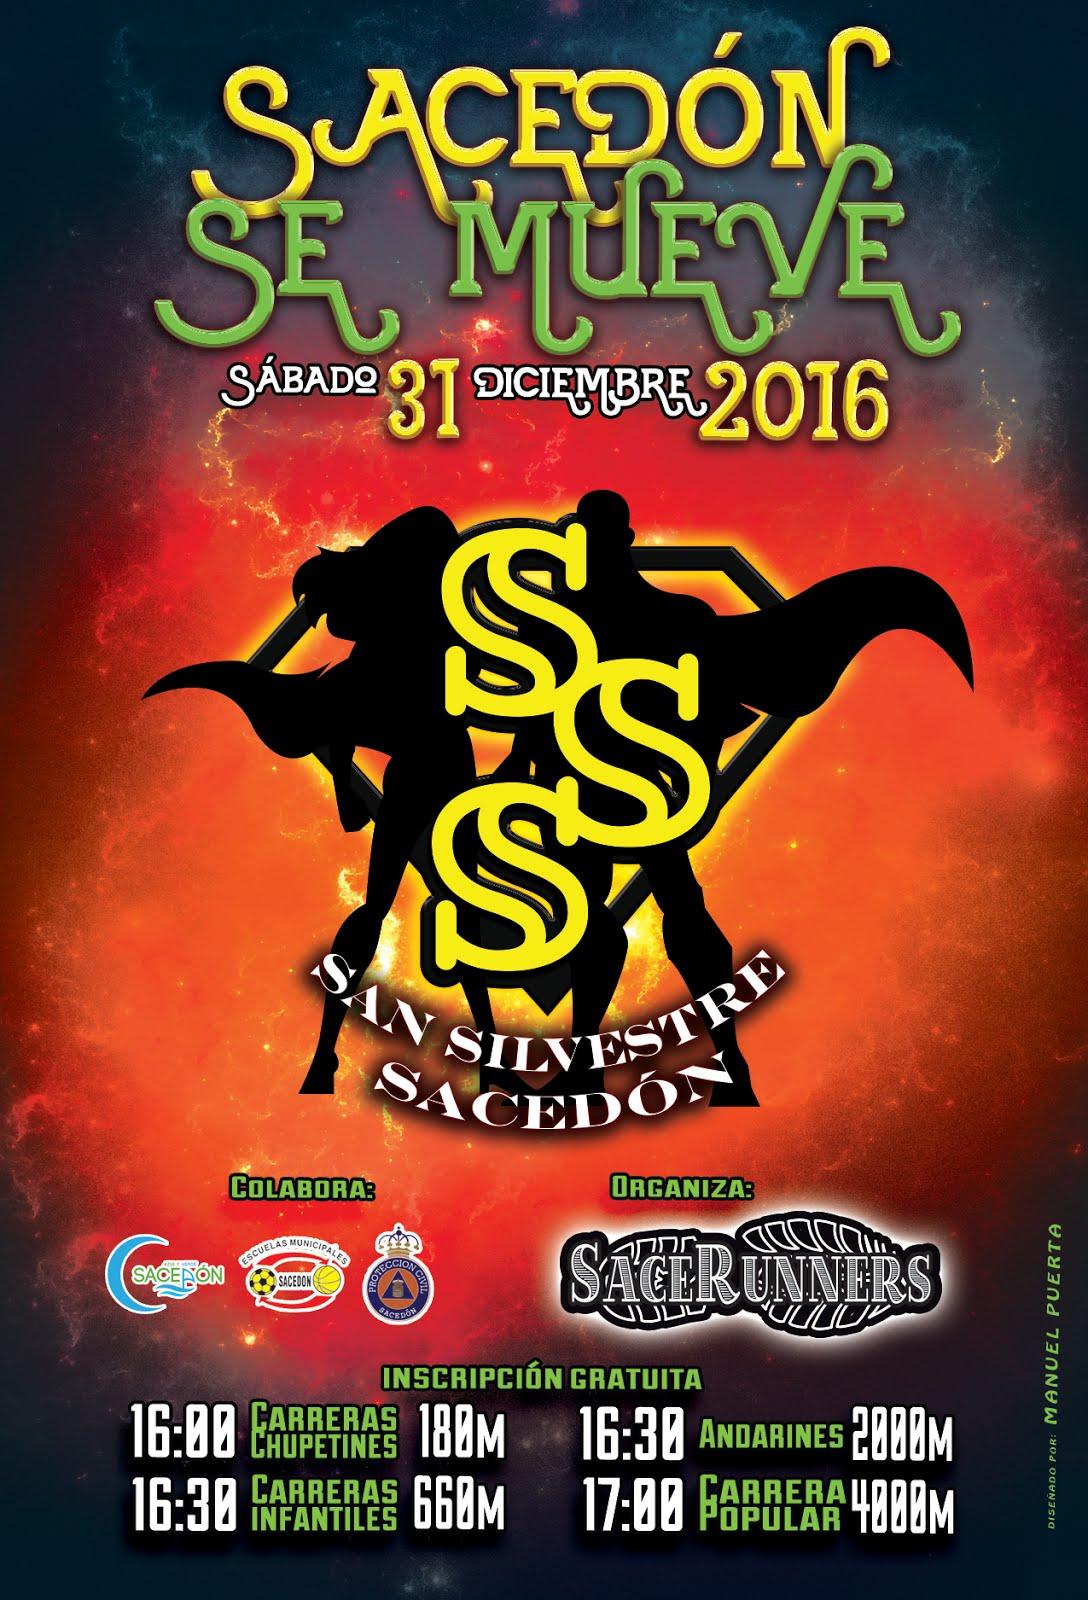 San Silvestre Sacedon 2016